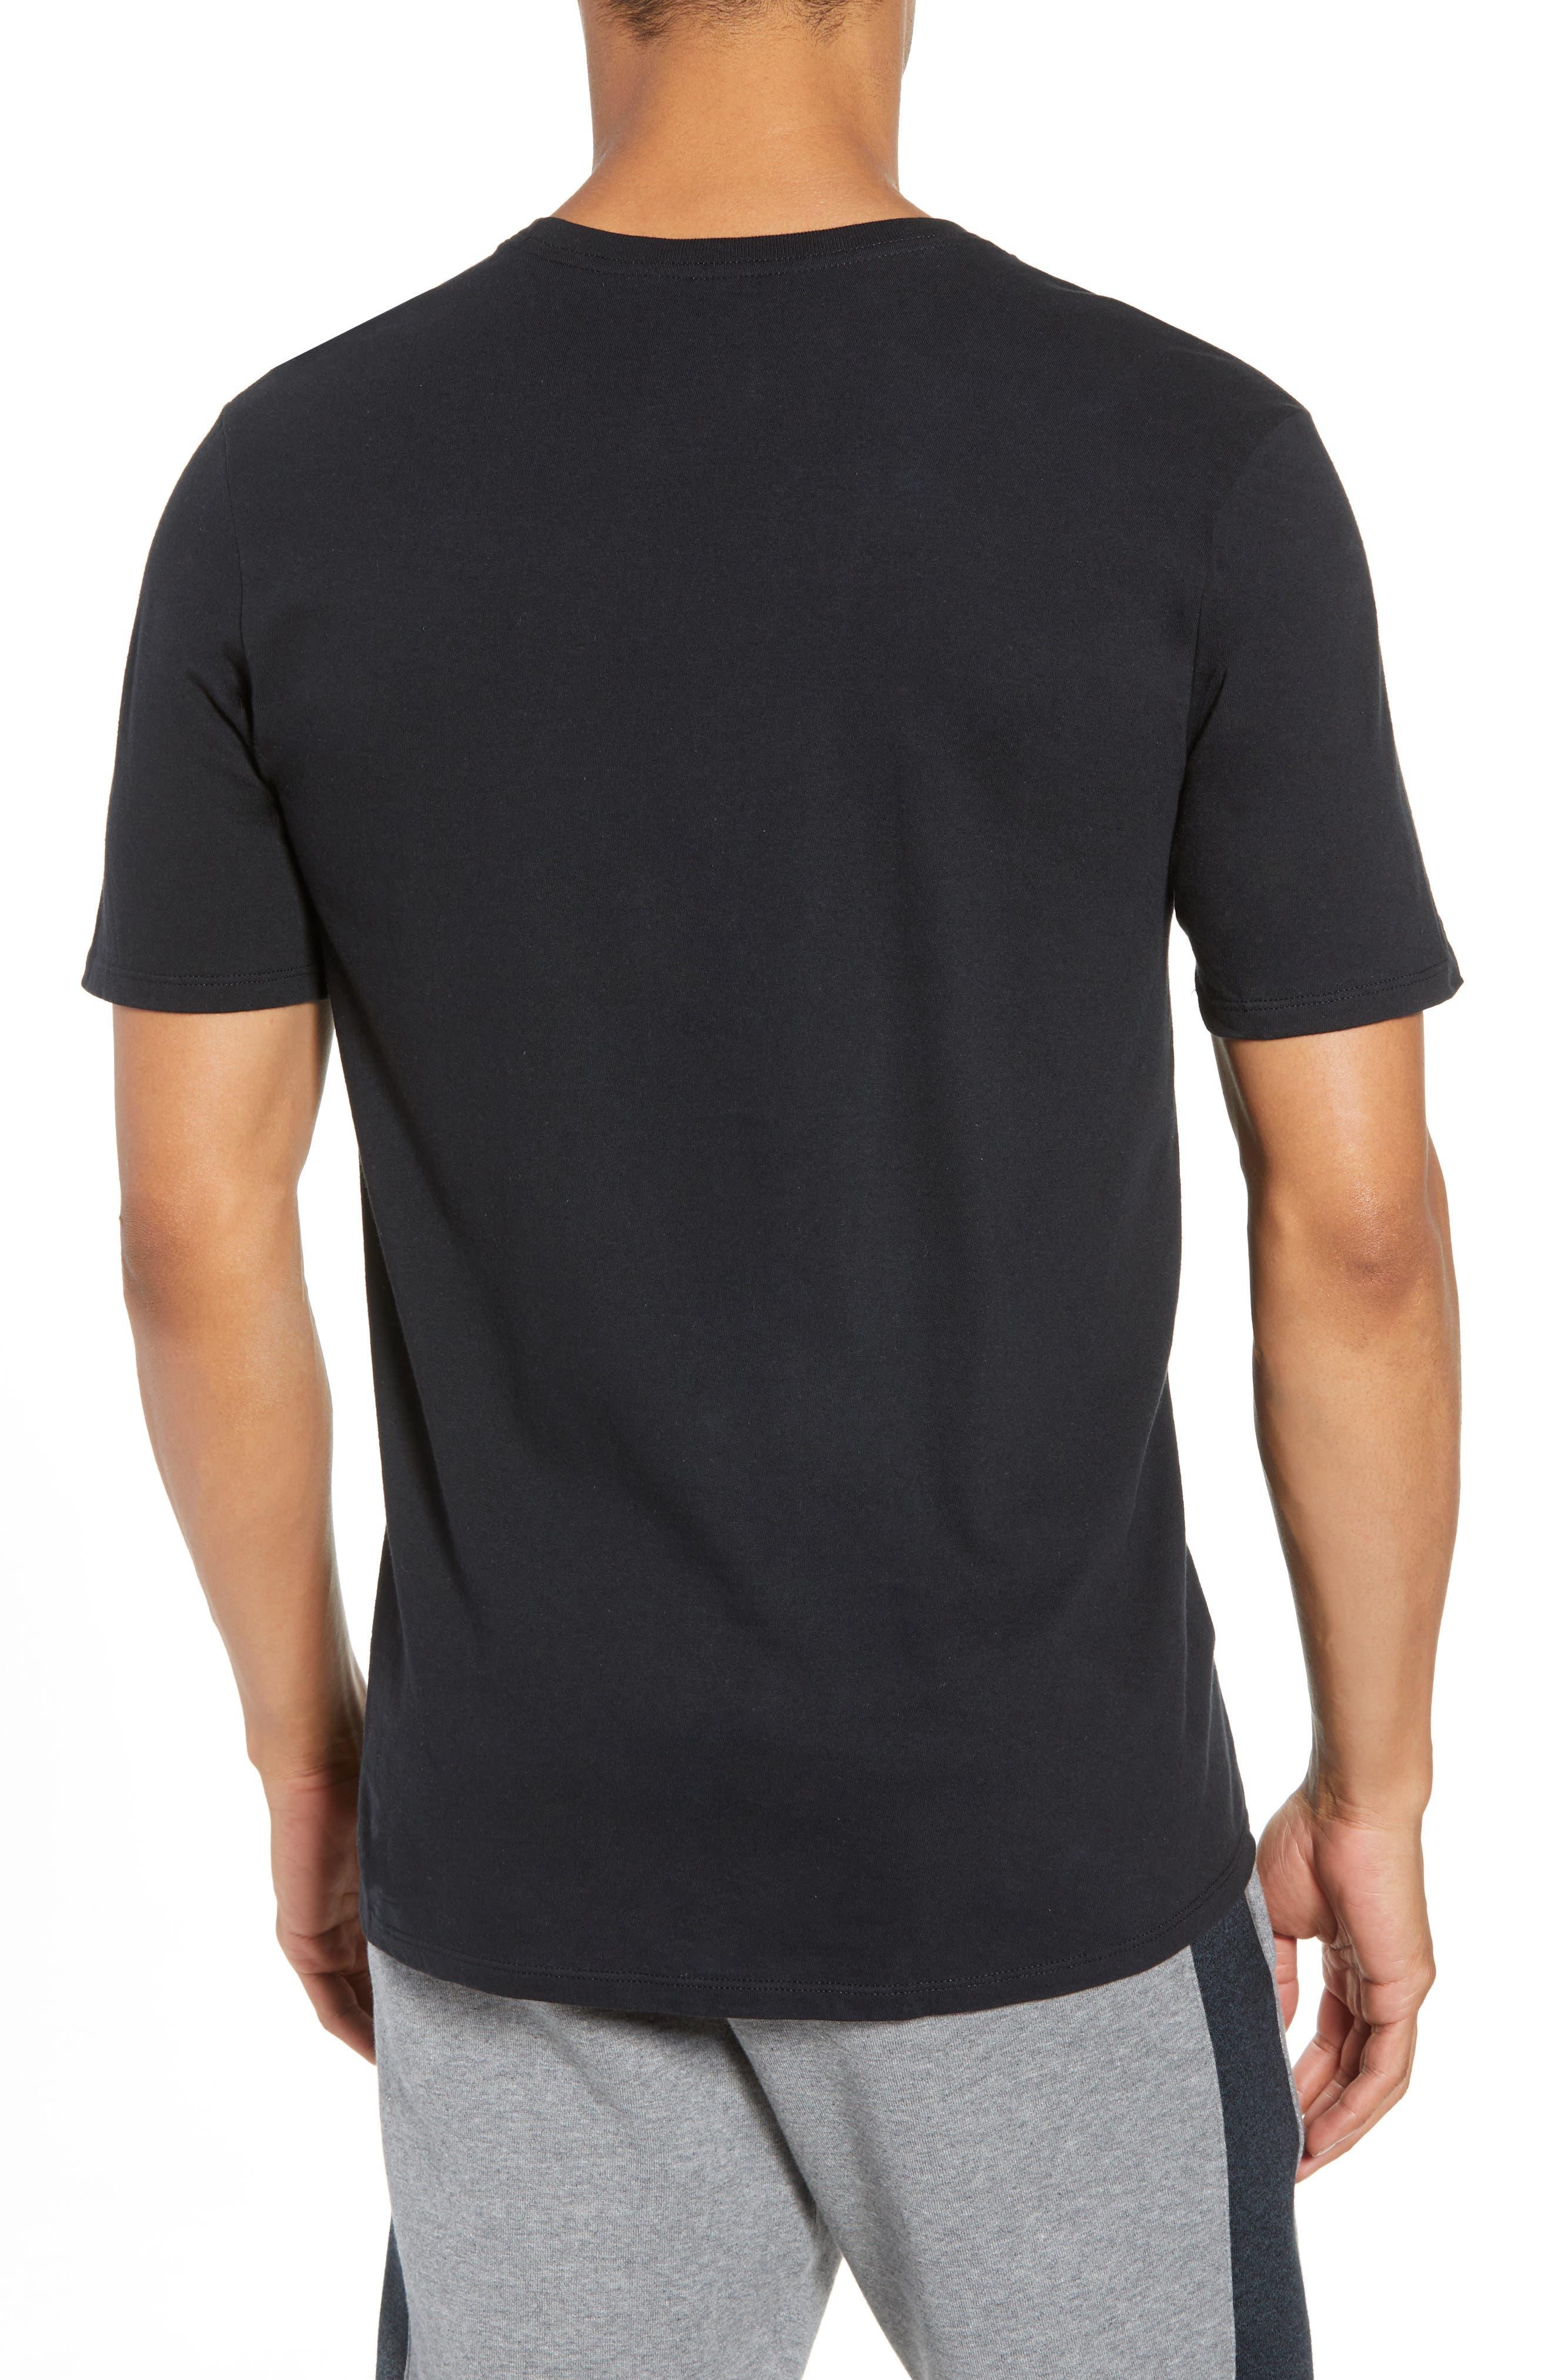 Sportswear More Money T-Shirt,                             Alternate thumbnail 2, color,                             Black/ Metallic Silver